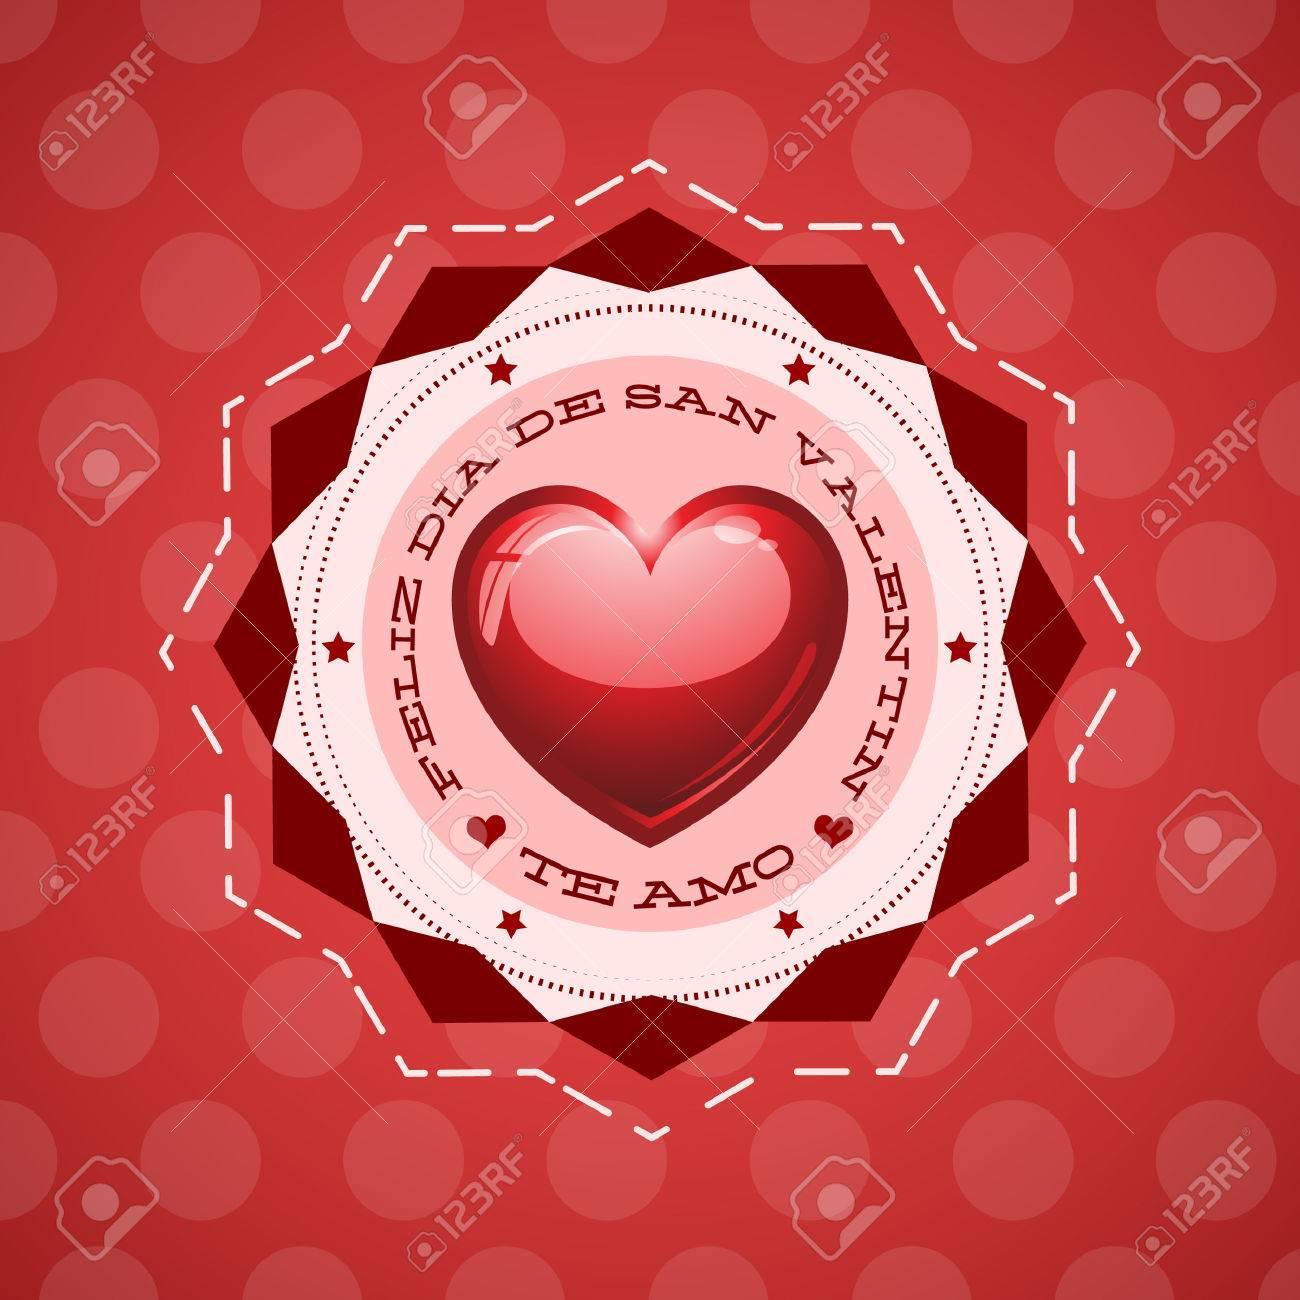 feliz dia de san valentin happy valentines day spanish text san valentine - San Valentines Day